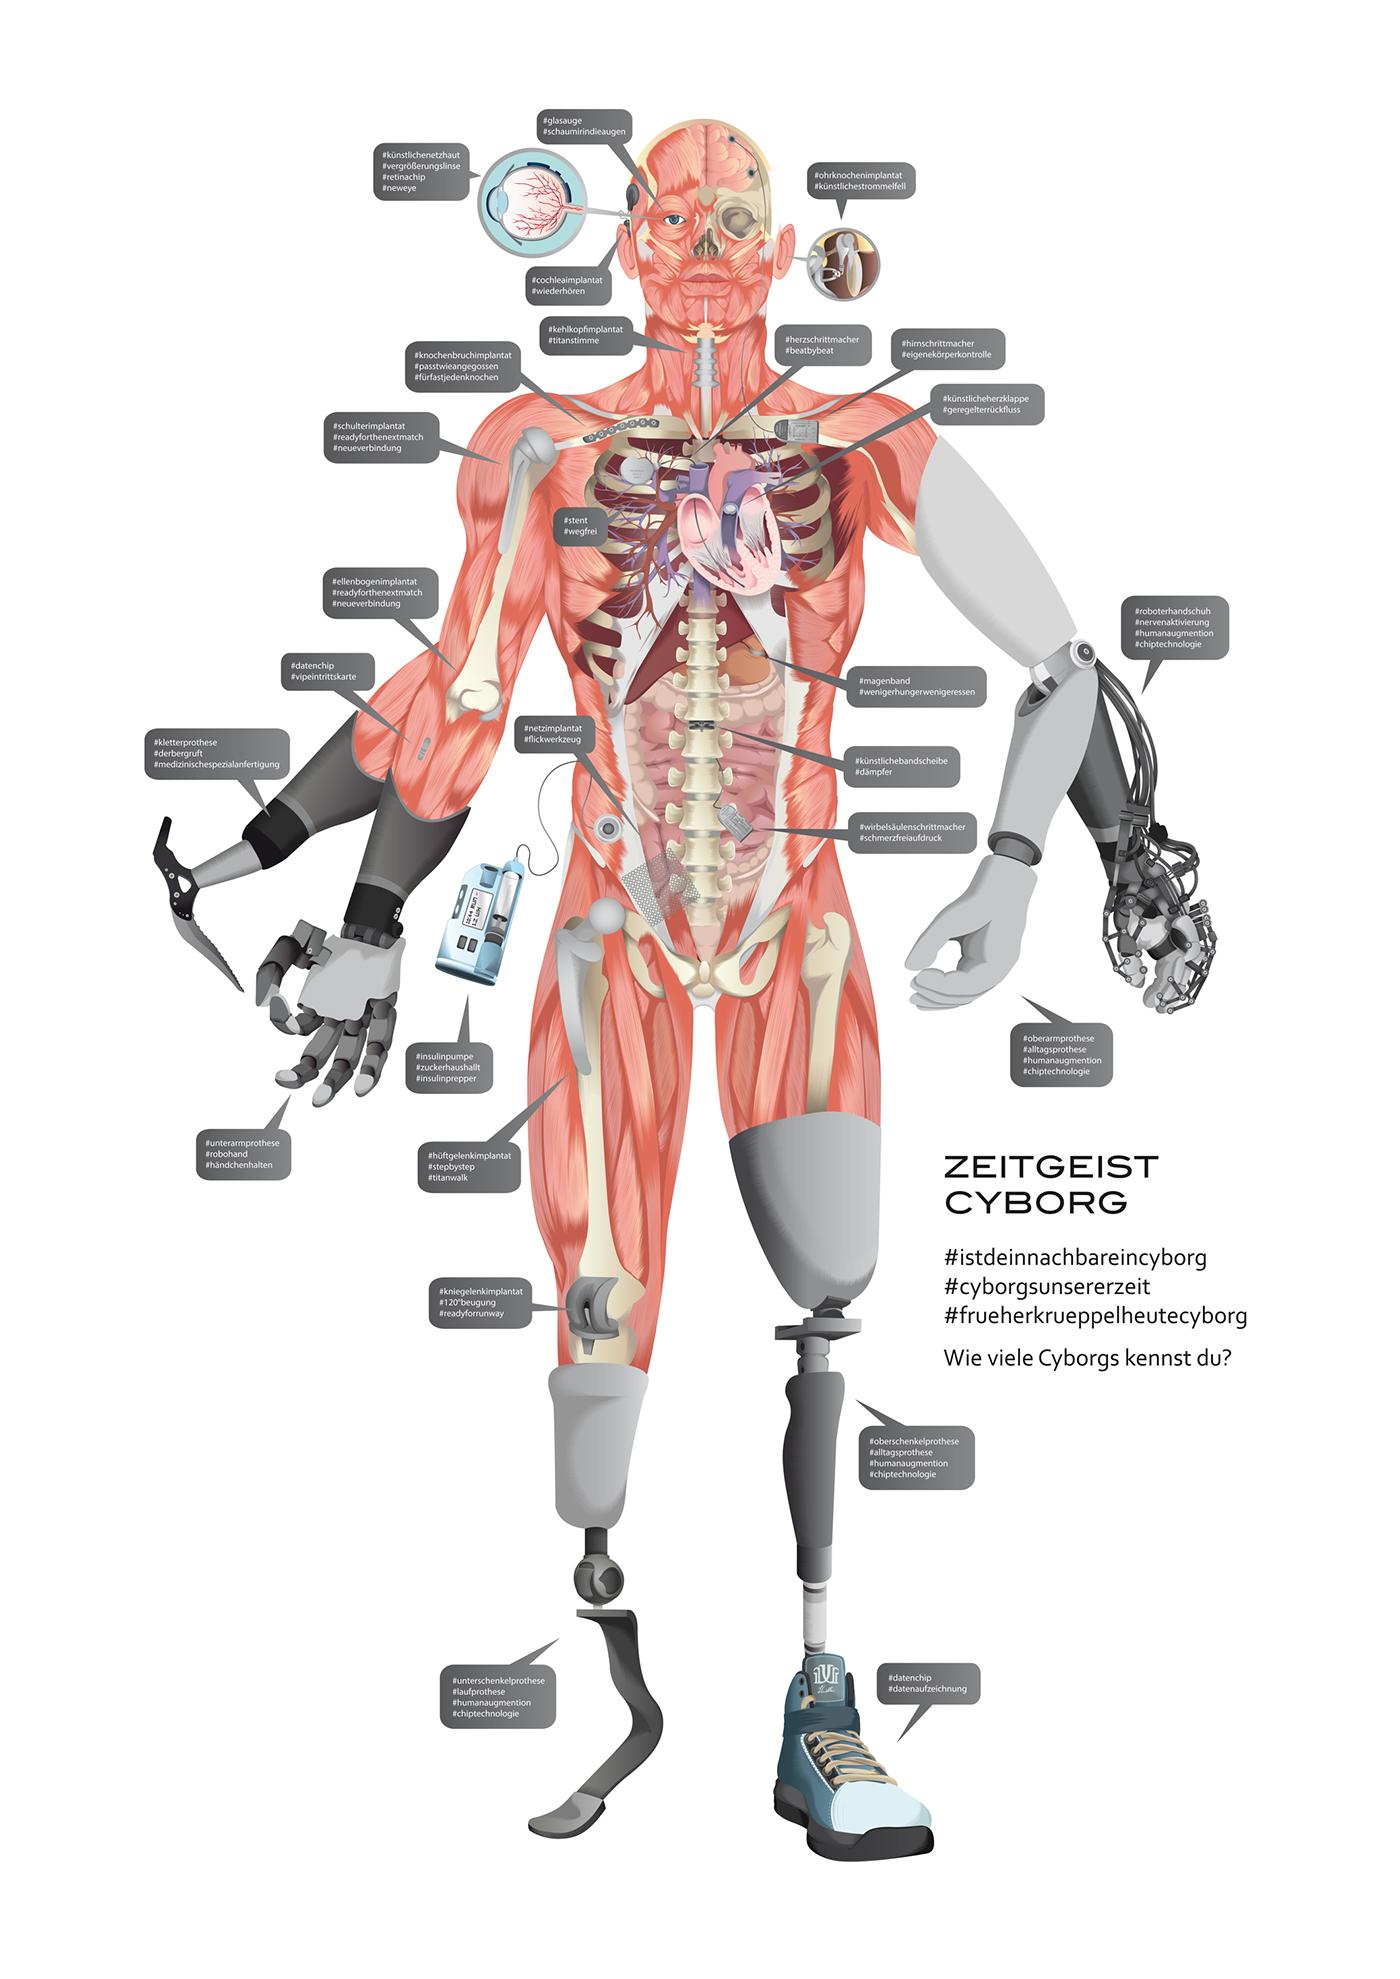 cyborgs unplugged essay T 923: haraway the cyborg manifesto, scott, blade runner (1982) , clark cyborgs unplugged r 925: letson portraits of machine consciousness , slonczewski science fiction and the life sciences (cc 174.